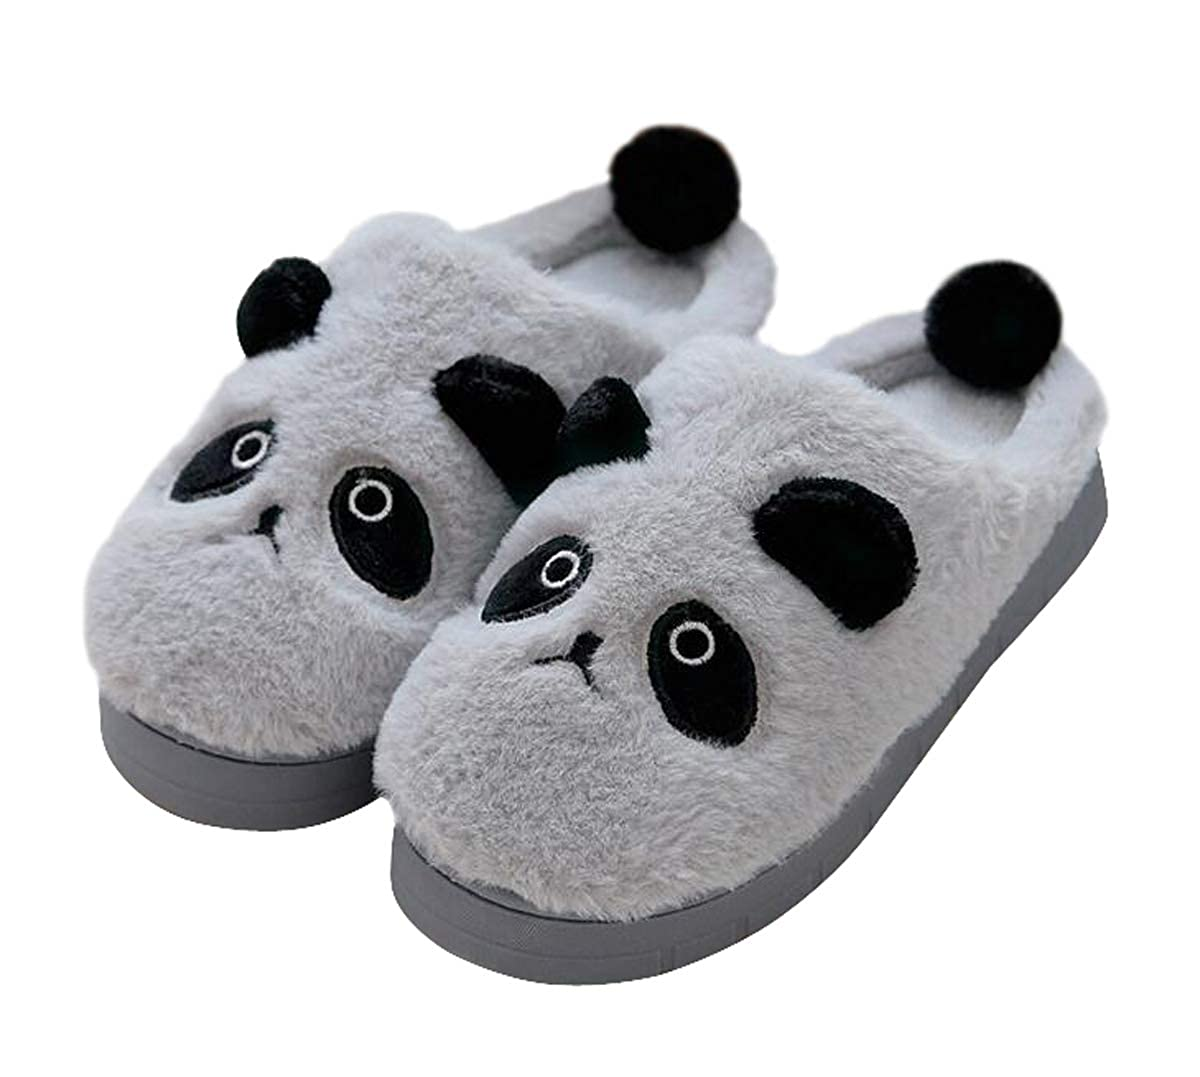 Adorable Cartoon Panda Womens Indoor Winter Warm Slippers Plush Slippers Soft Cozy Slip-on Slipper